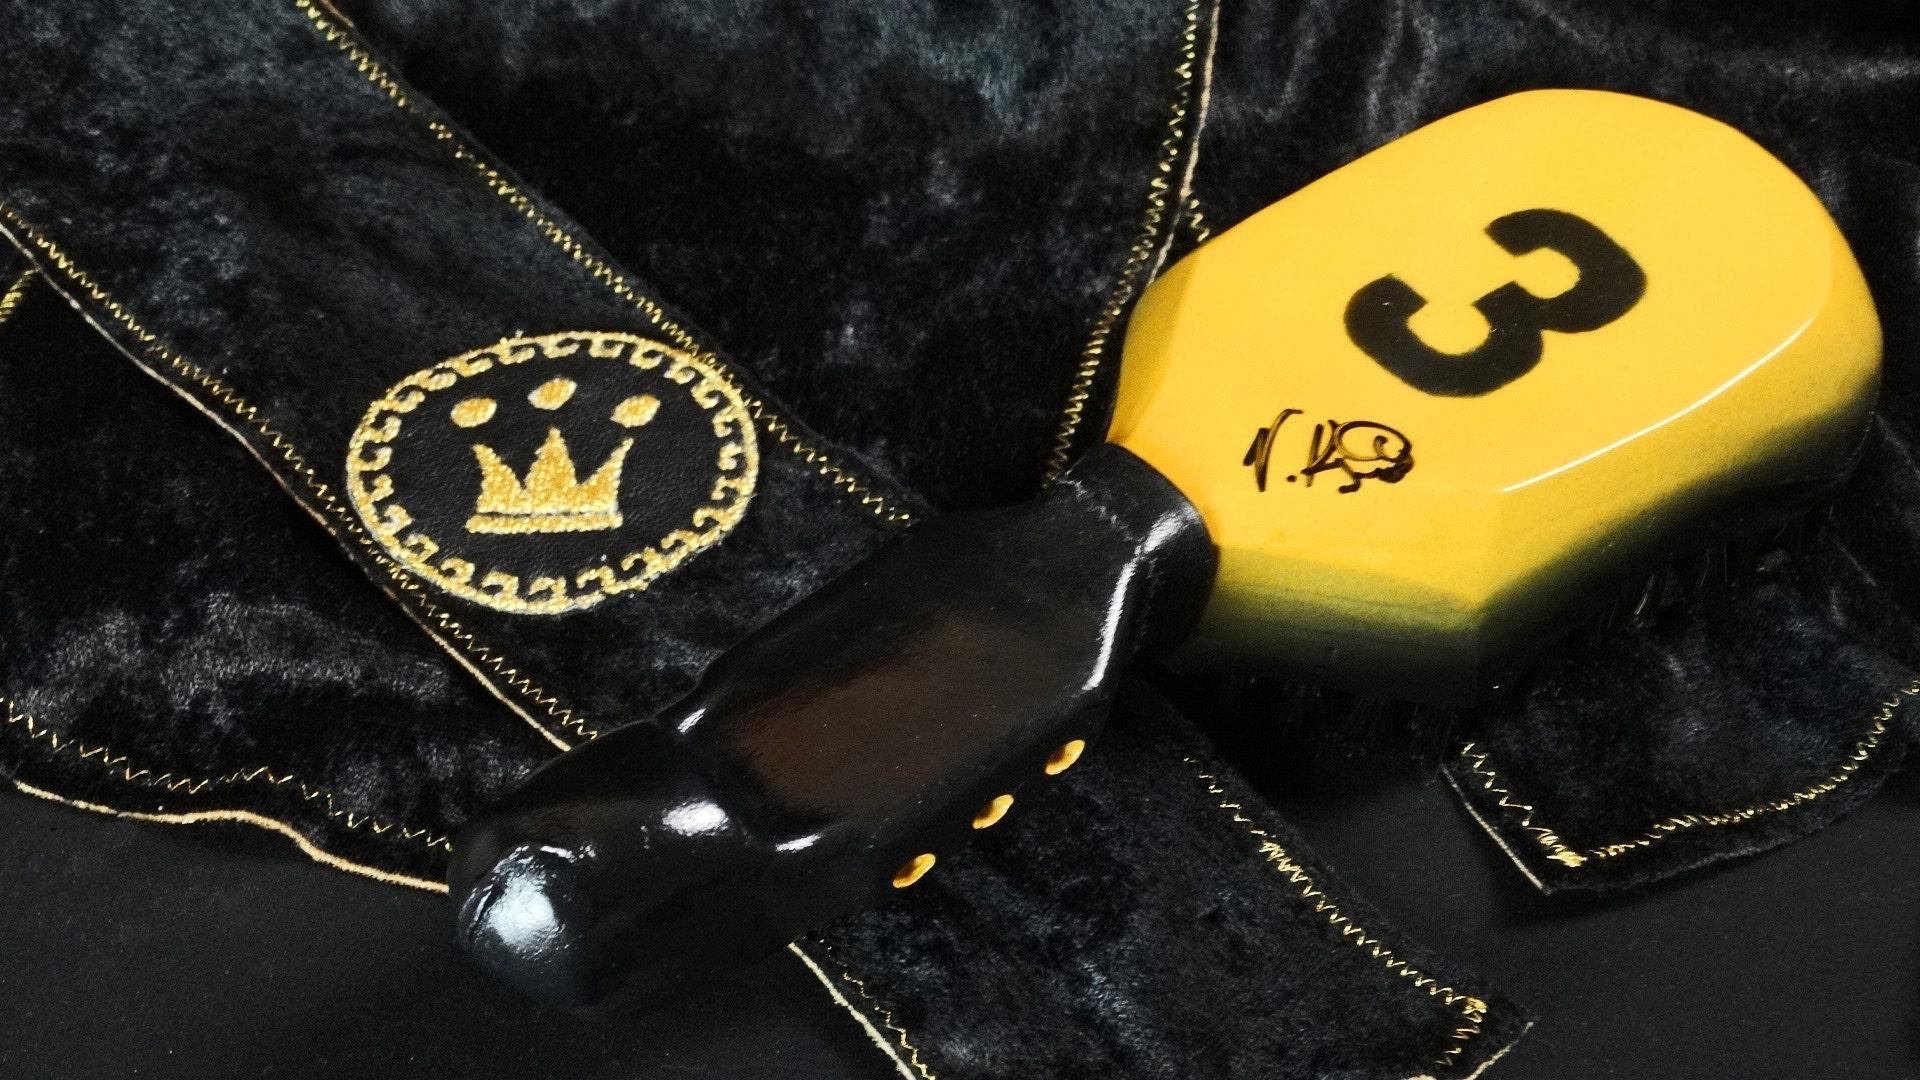 360 Crushed Velvet Fat Lace Custom Du-Rag/Hair Wrap/Turban/Do-Rag - 10 Row King Scorpion Custom 360 Wave Brush Gift Bundle